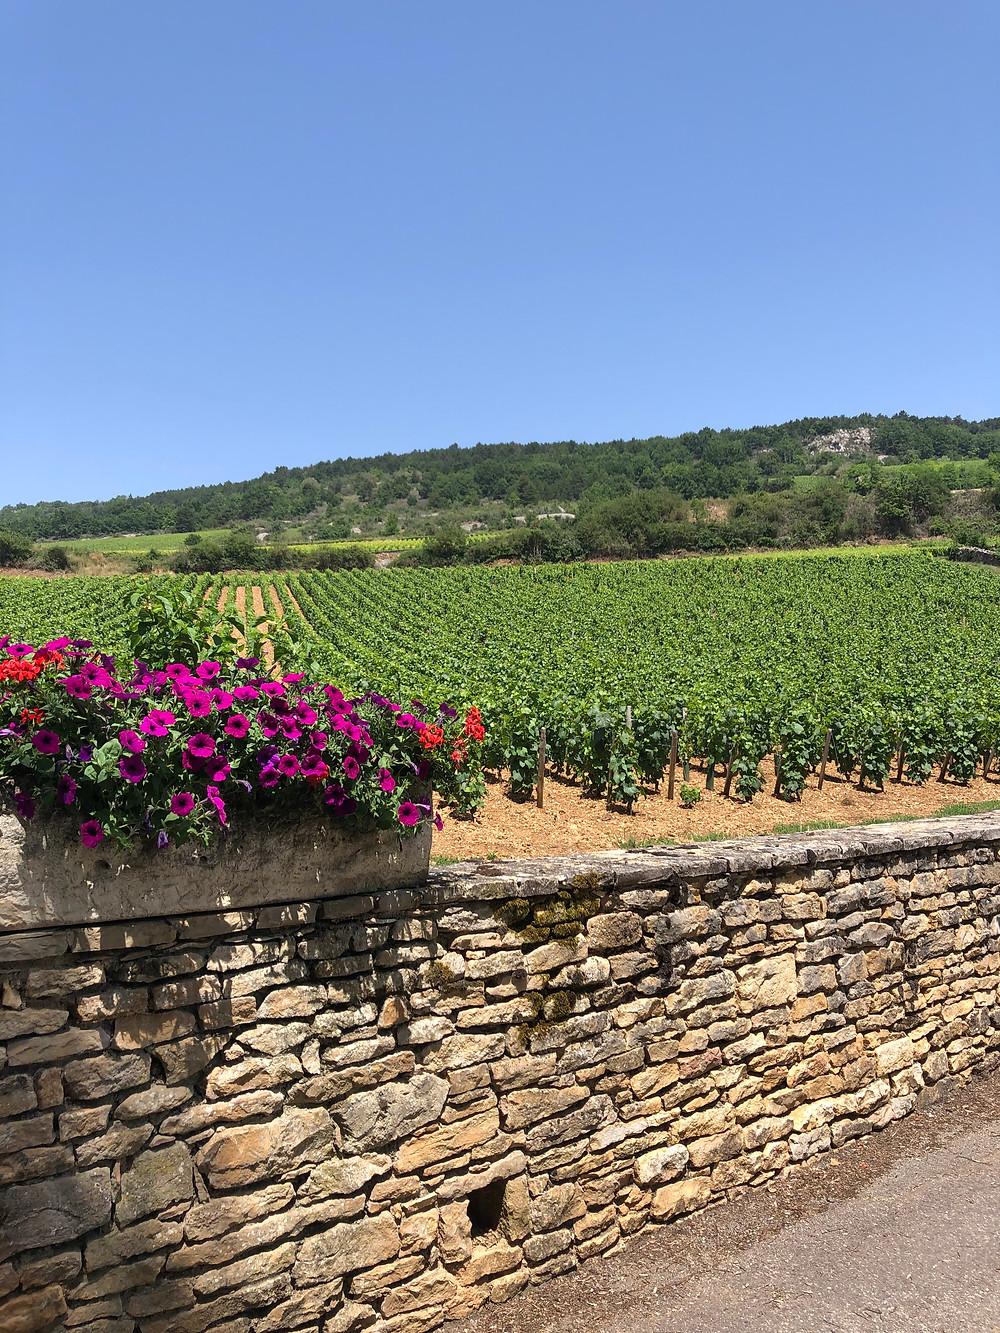 Santenay Premier Cru vineyards in Cote de Beaune Burdgundy on a wine tasting tour